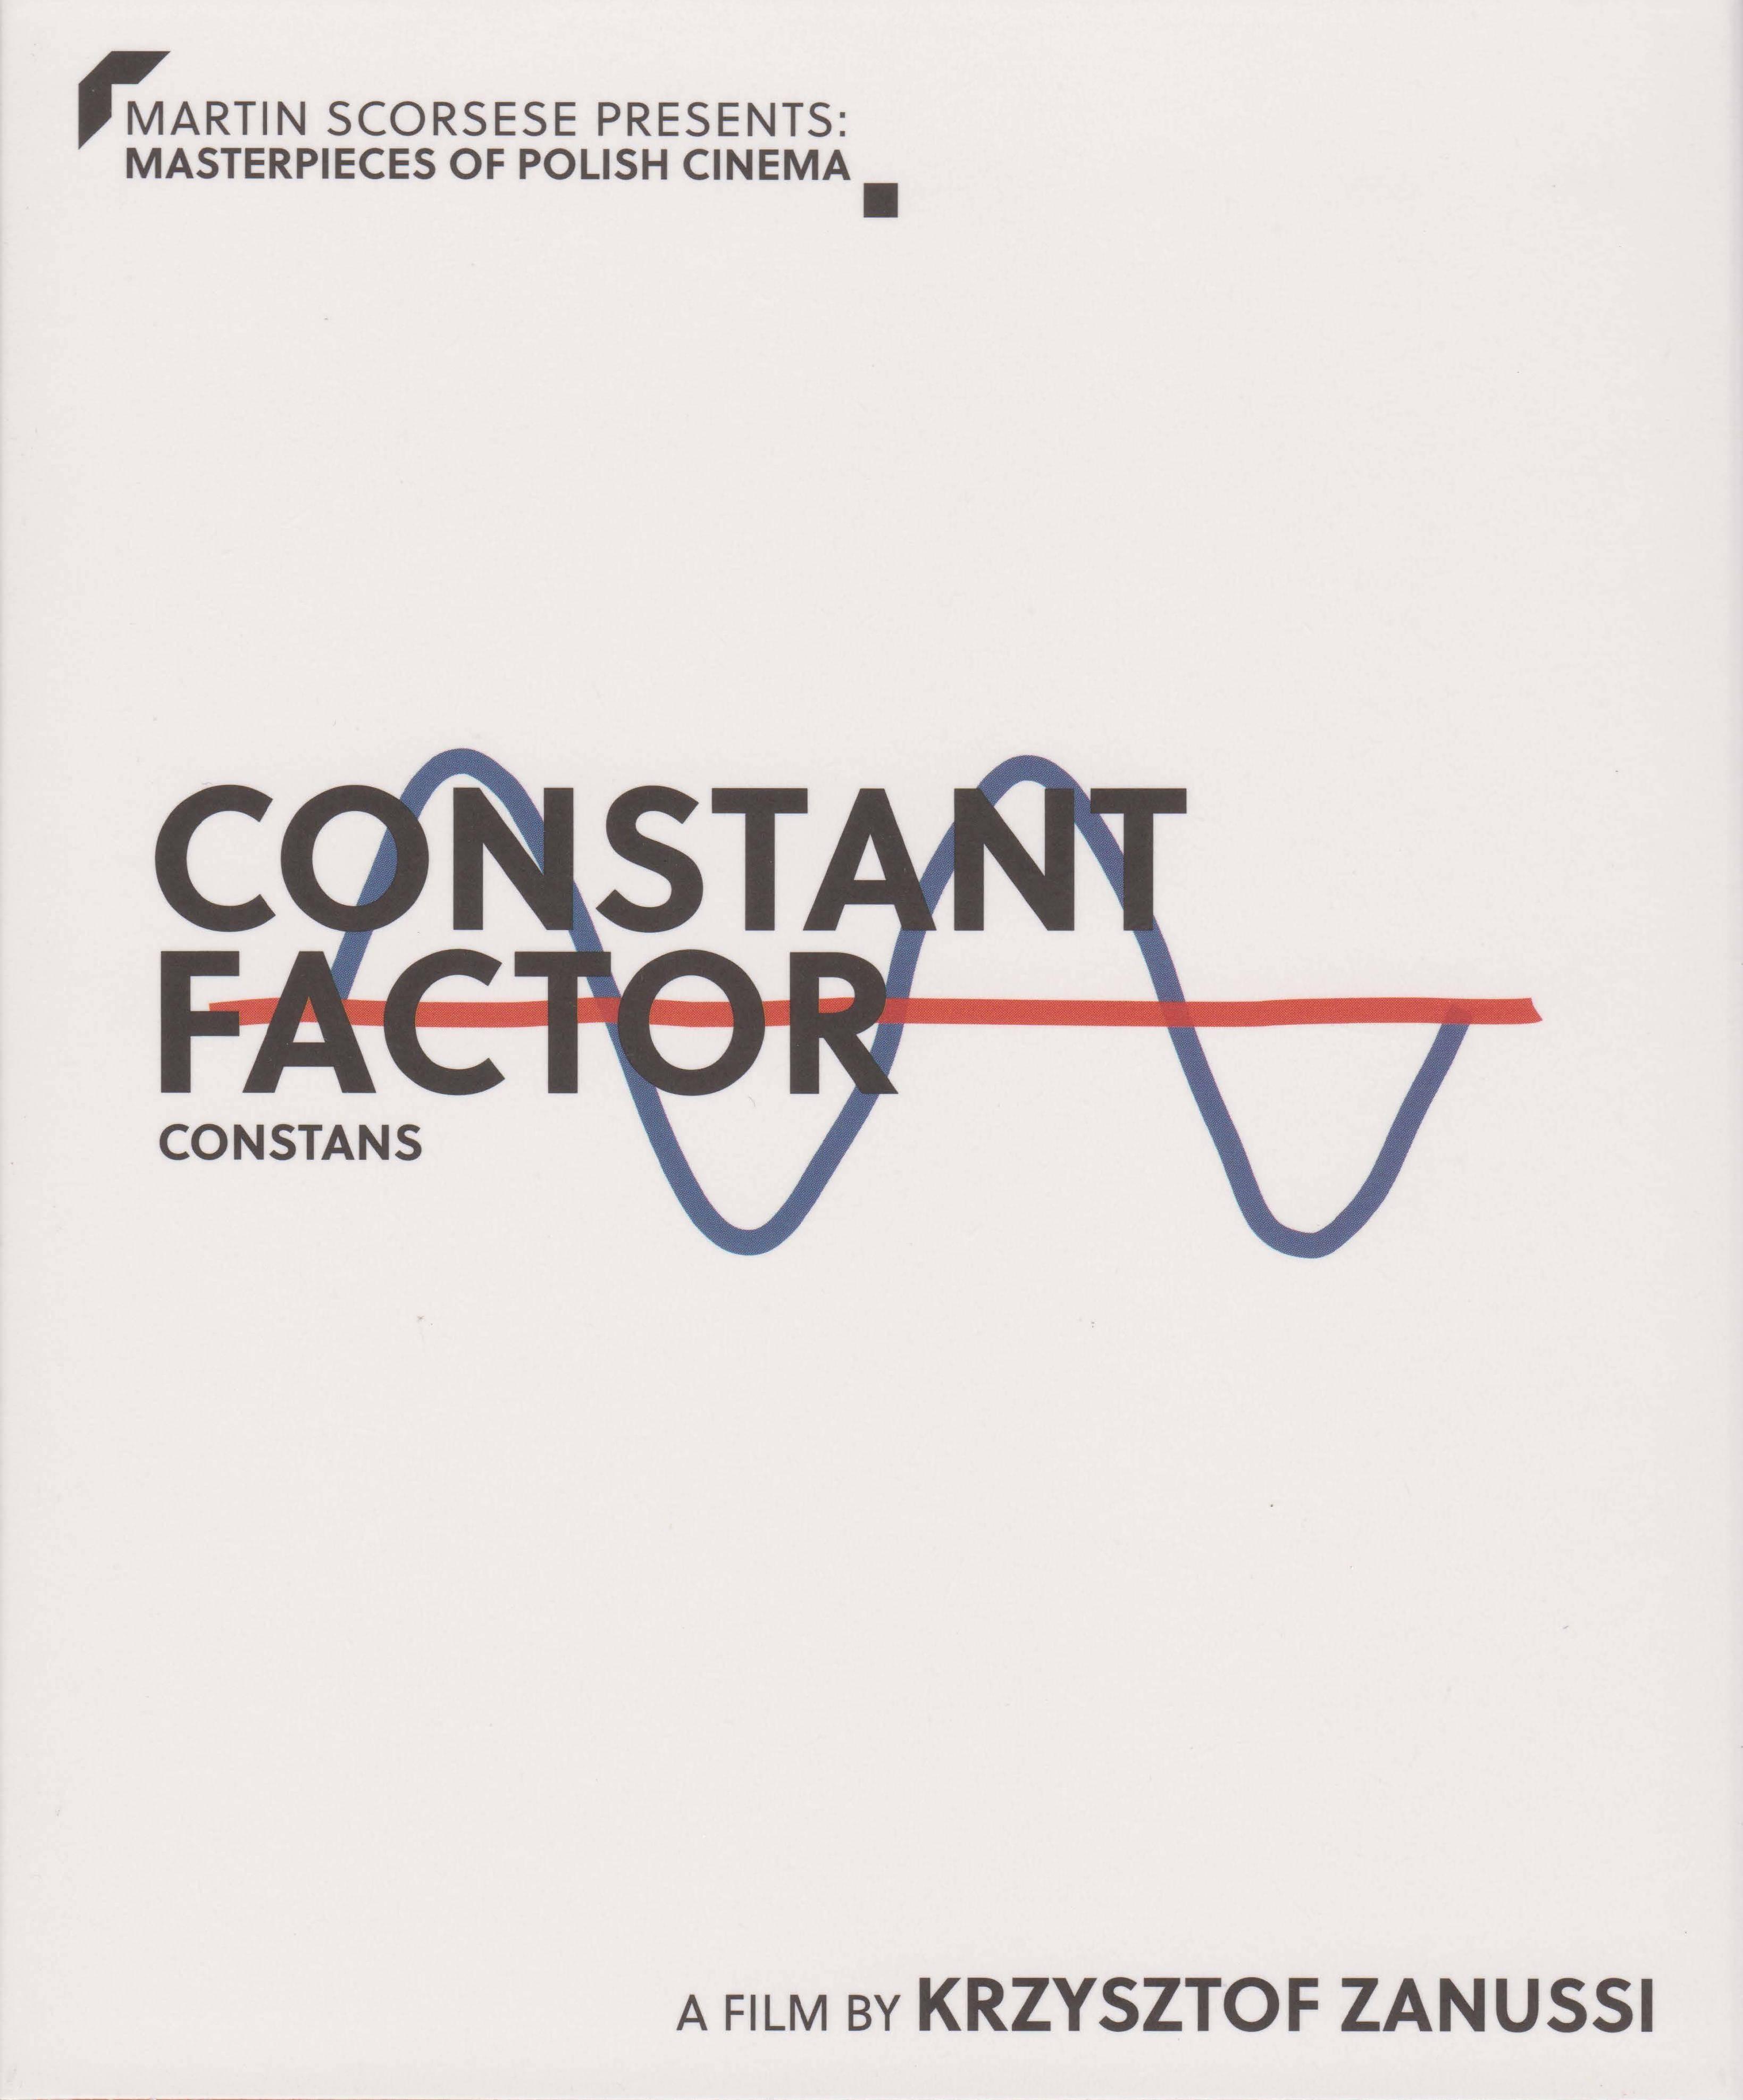 Martin Scorsese Presents: Masterpieces of Polish Cinema Volume 1. BR 3: The Constant Factor / Constans (1980)